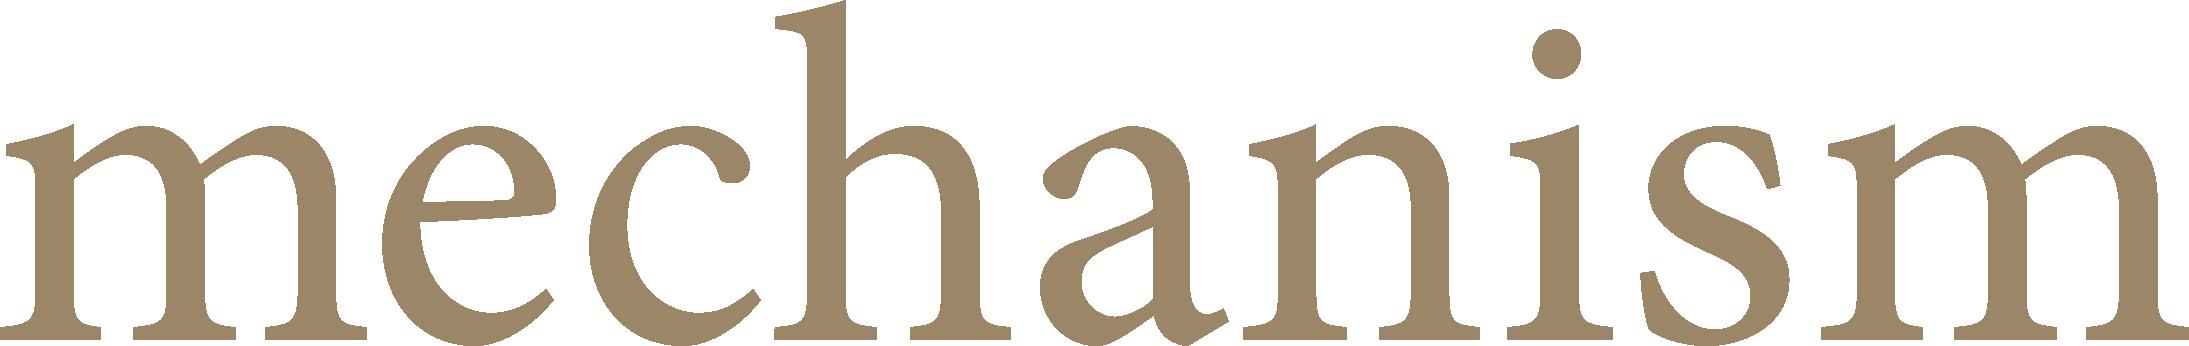 Mechanism logo